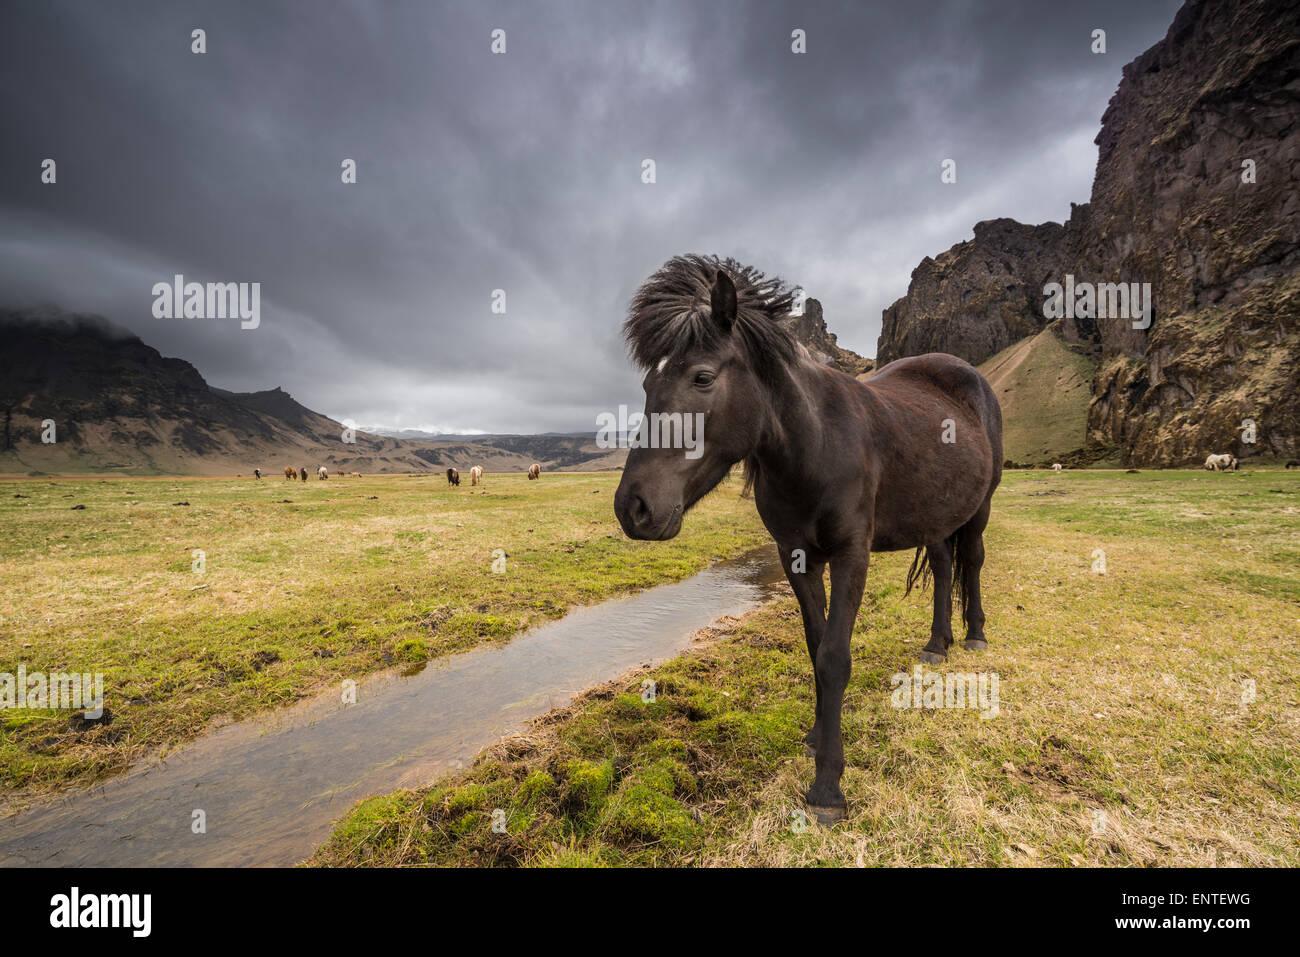 Islandia - caballo caballo islandés en el paisaje de Islandia Imagen De Stock